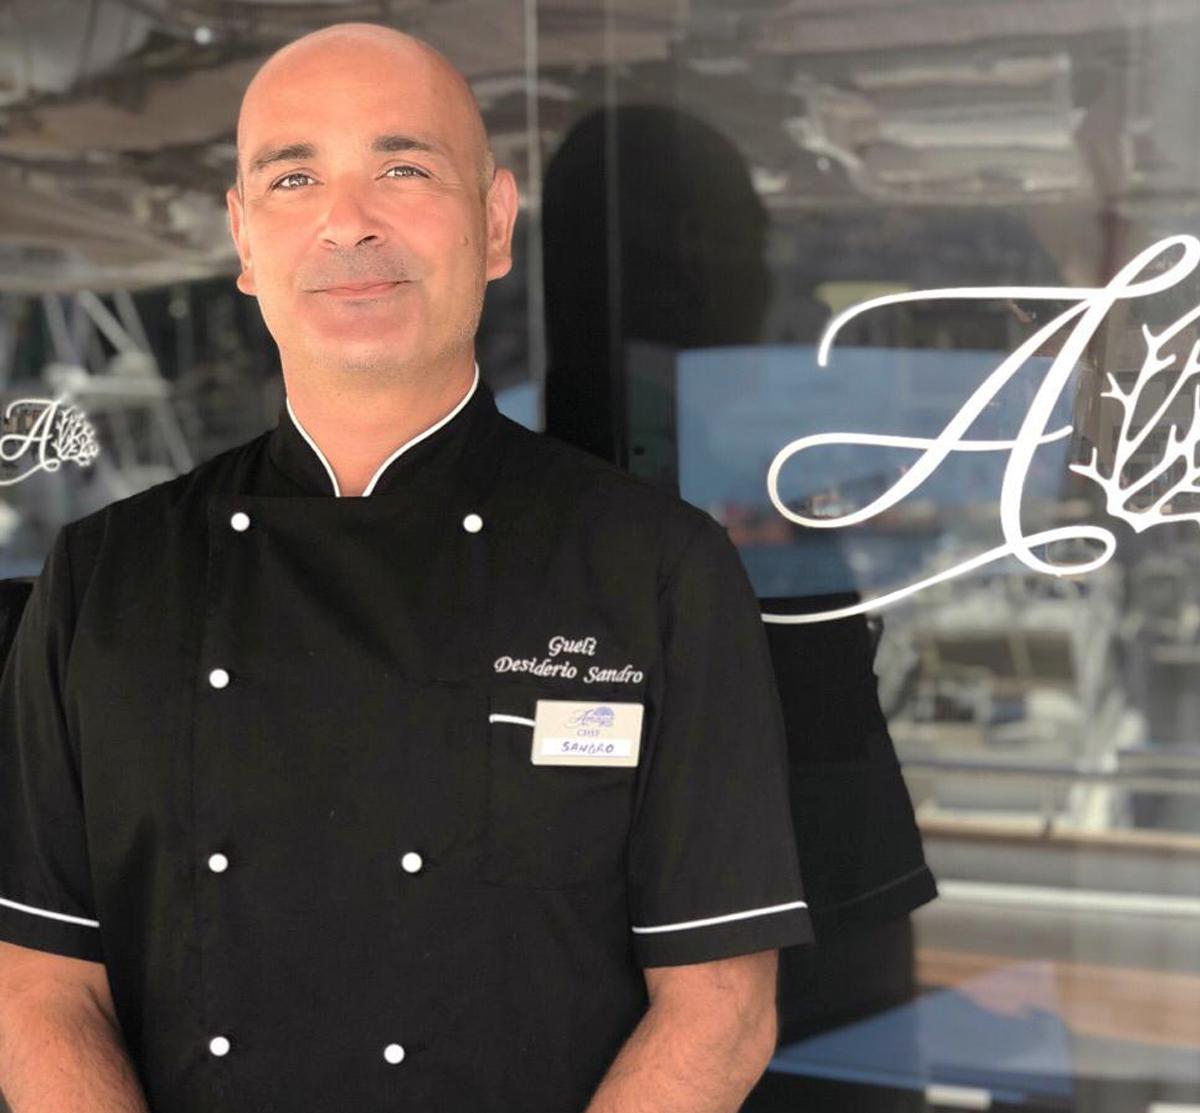 https://www.amayayacht.com/wp-content/uploads/2019/06/Chef-Gueli.jpg